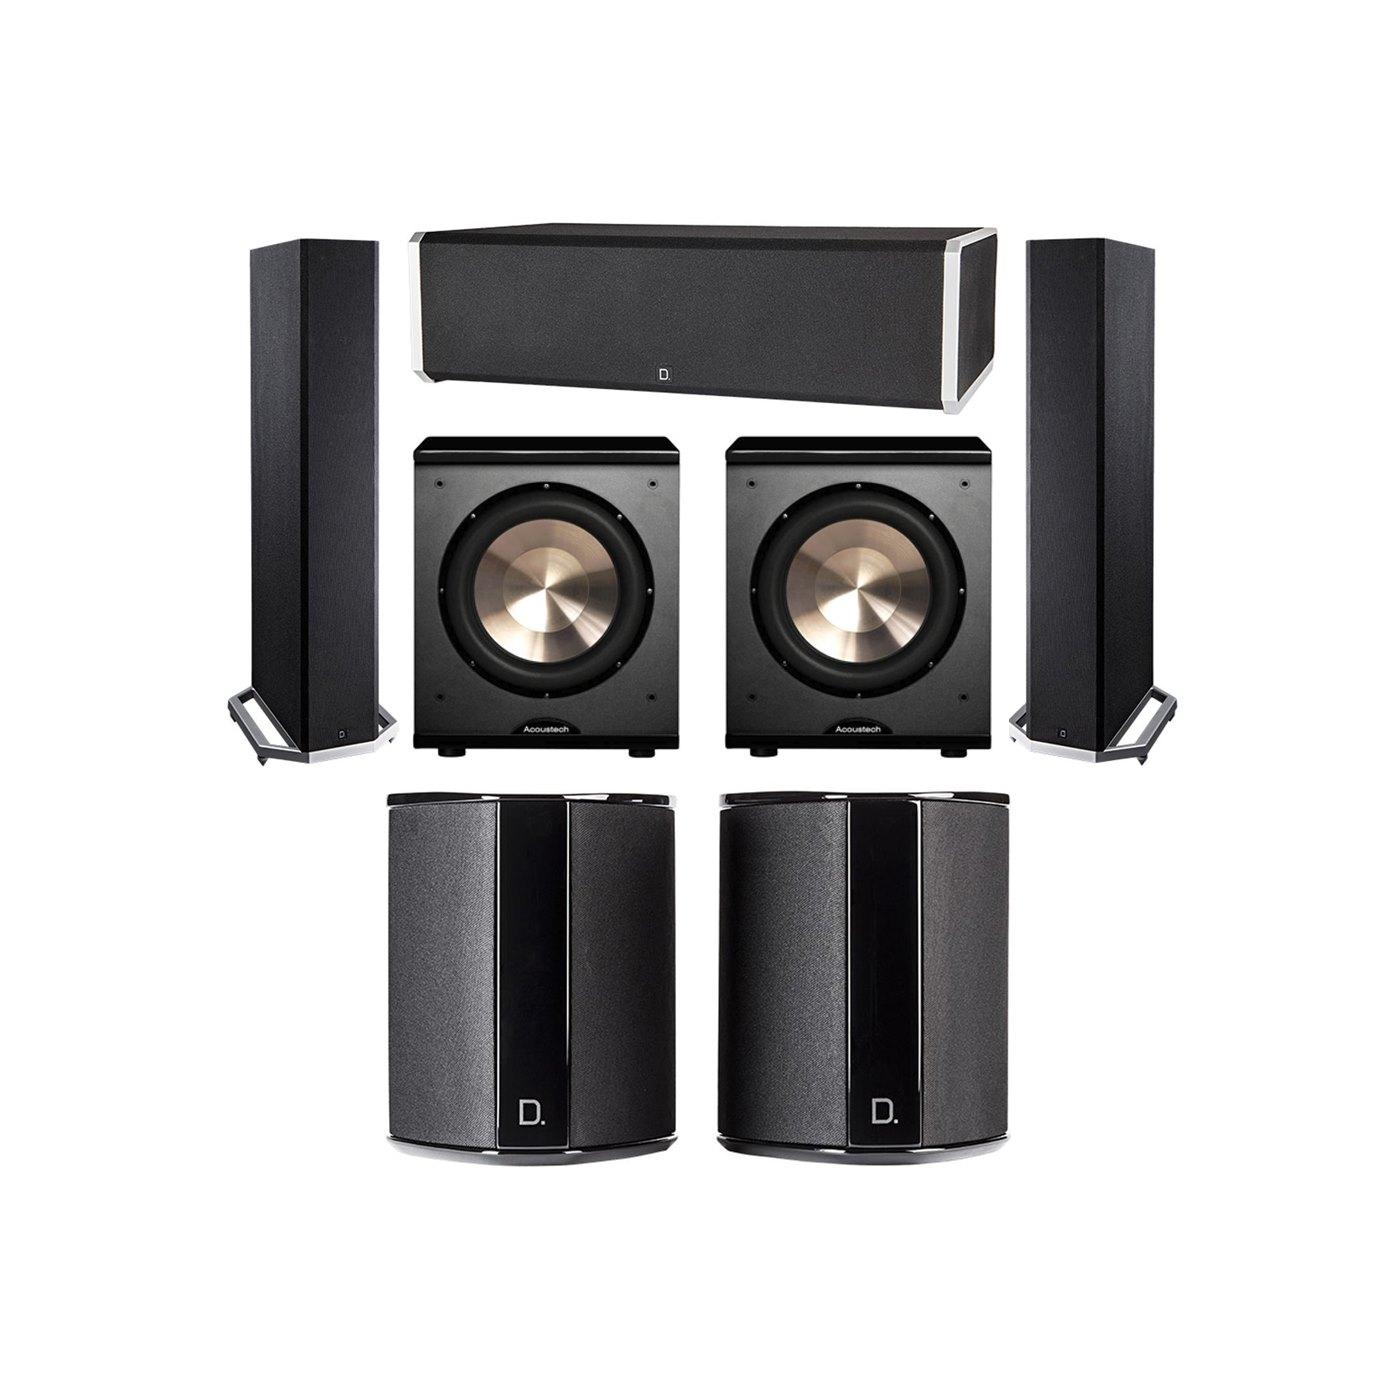 Definitive Technology 5.2 System with 2 BP9020 Tower Speakers, 1 CS9060 Center Channel Speaker, 2 SR9040 Surround Speaker, 2 BIC PL-200 Subwoofer